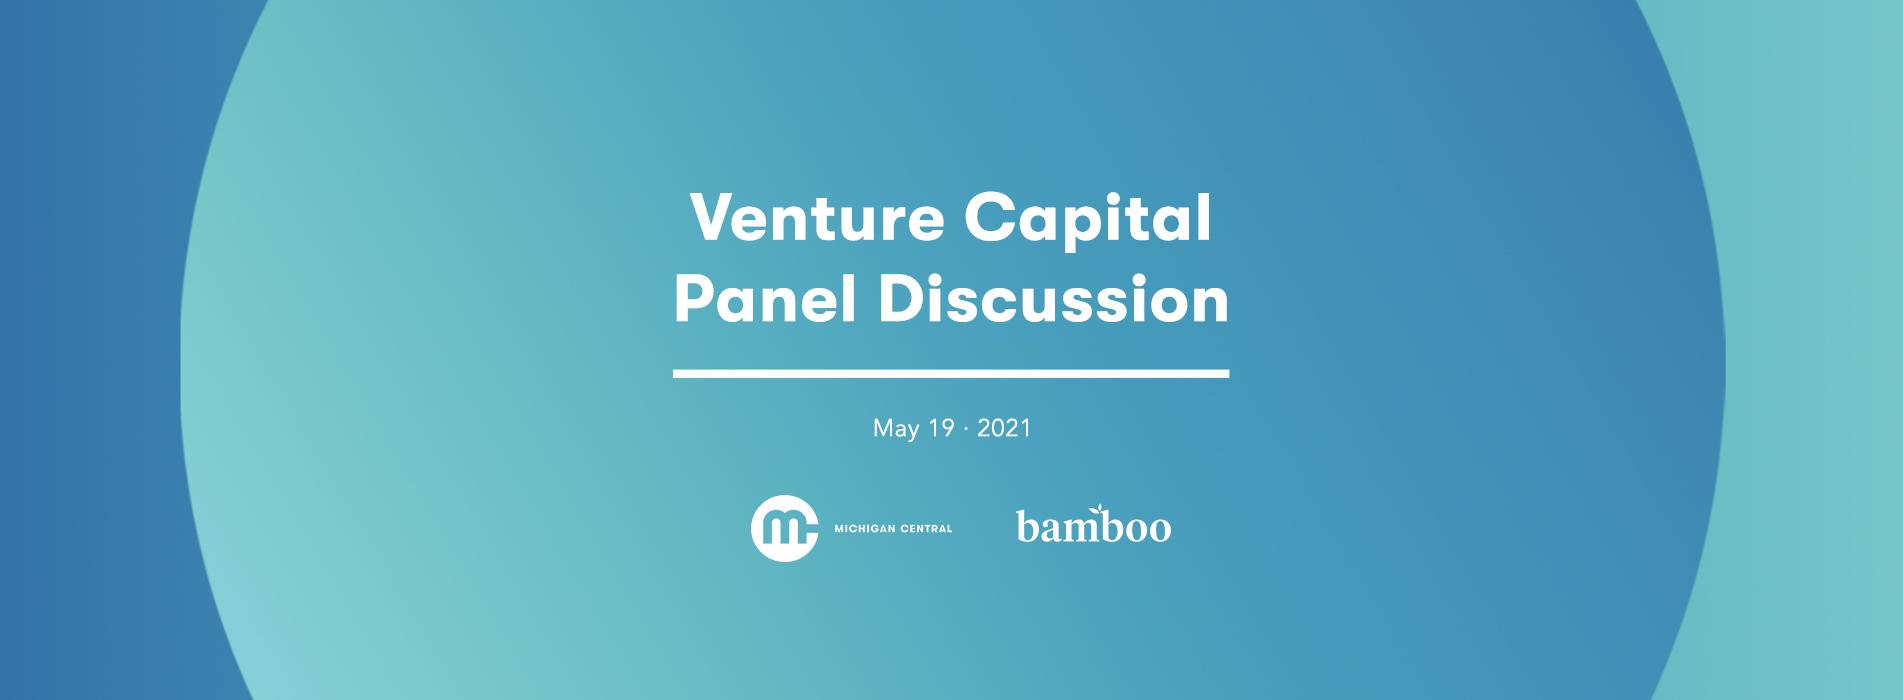 venture capital panel discussion